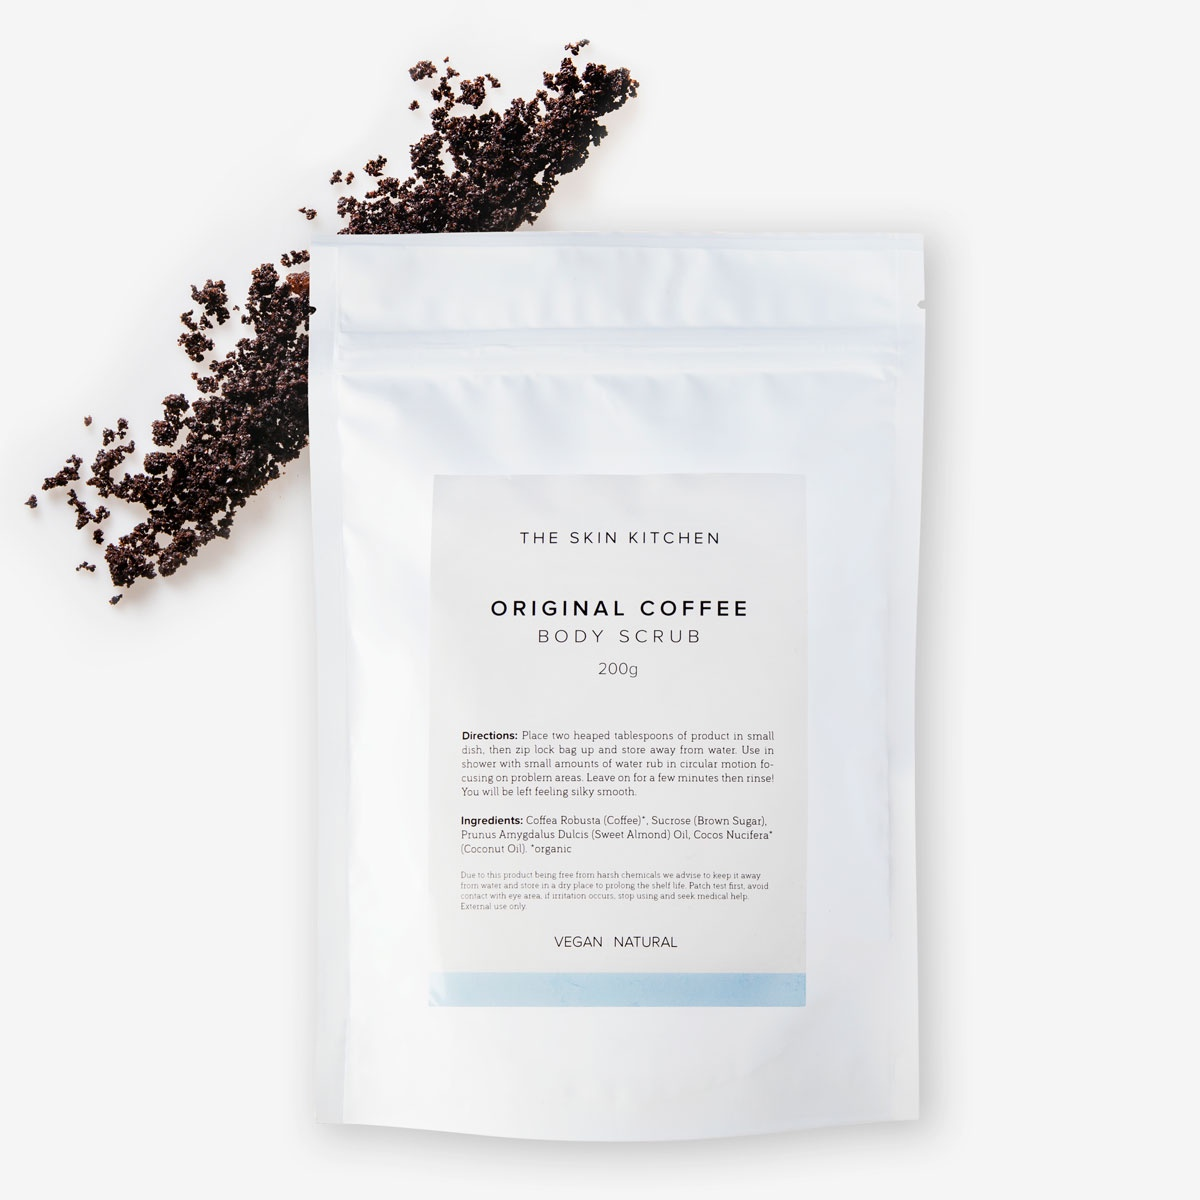 ORIGINAL COFFEE BODY SCRUB